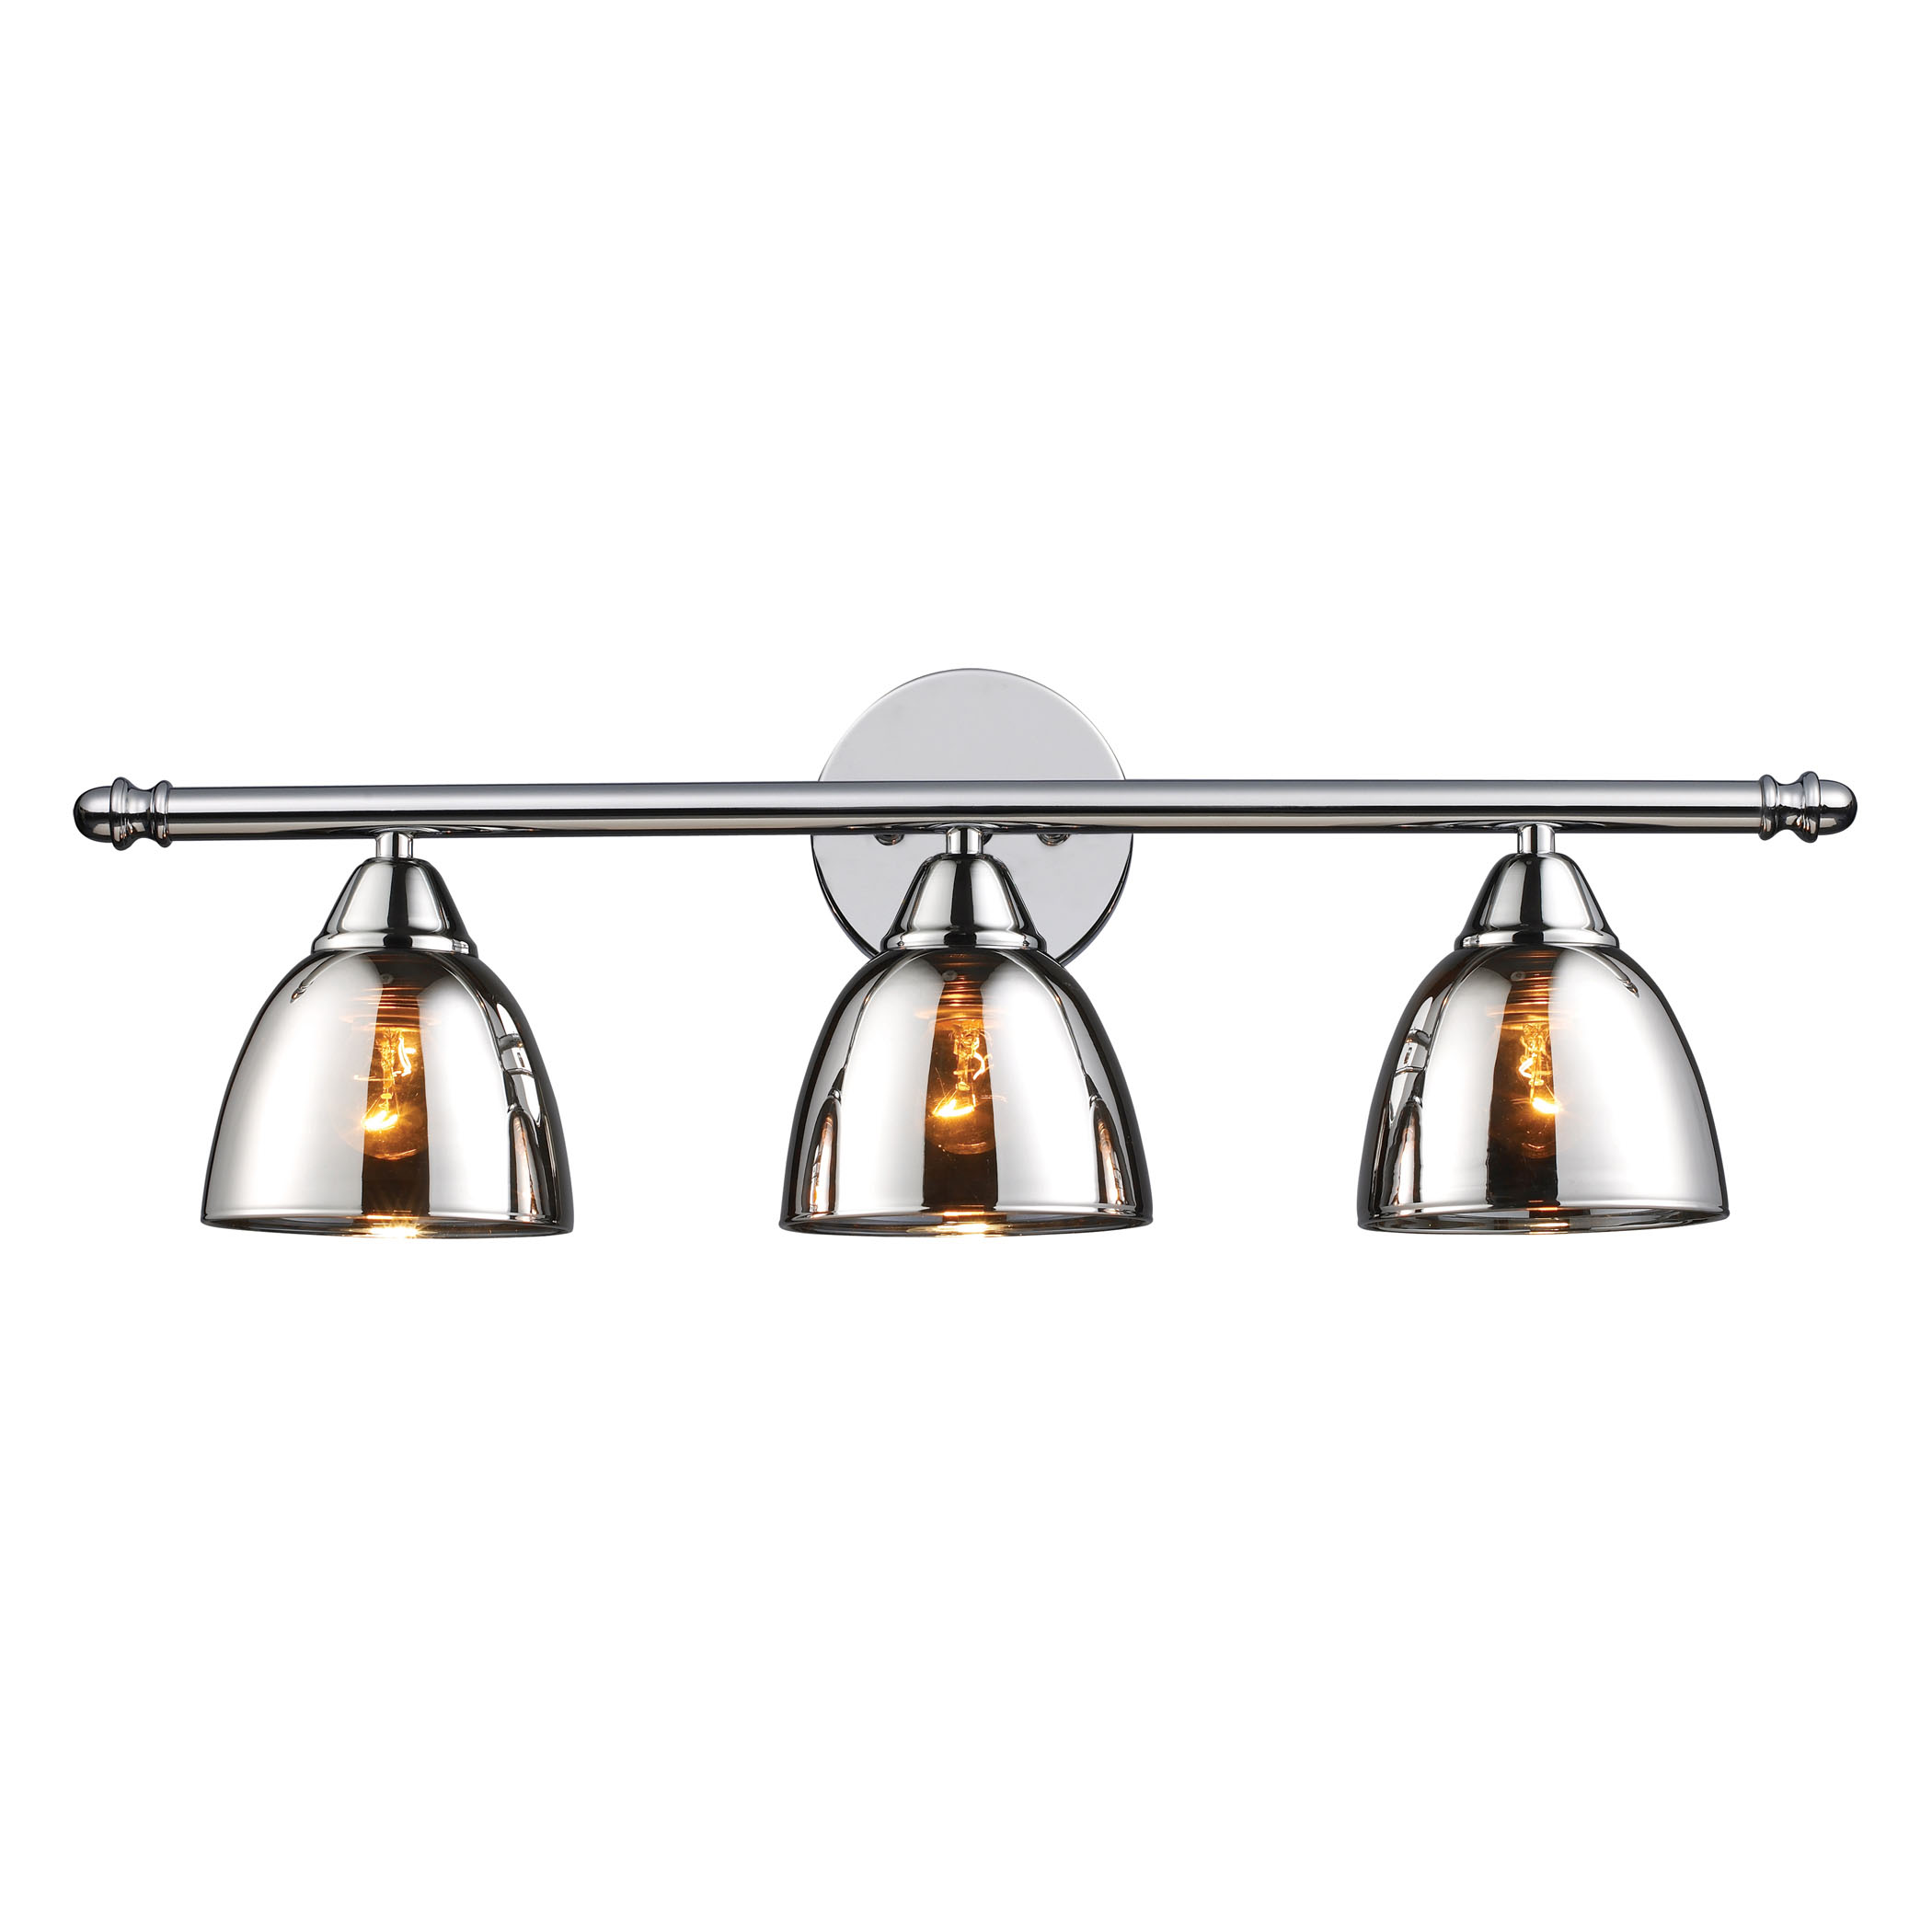 Reflections 3-Light Bath Bar in Polished Chrome